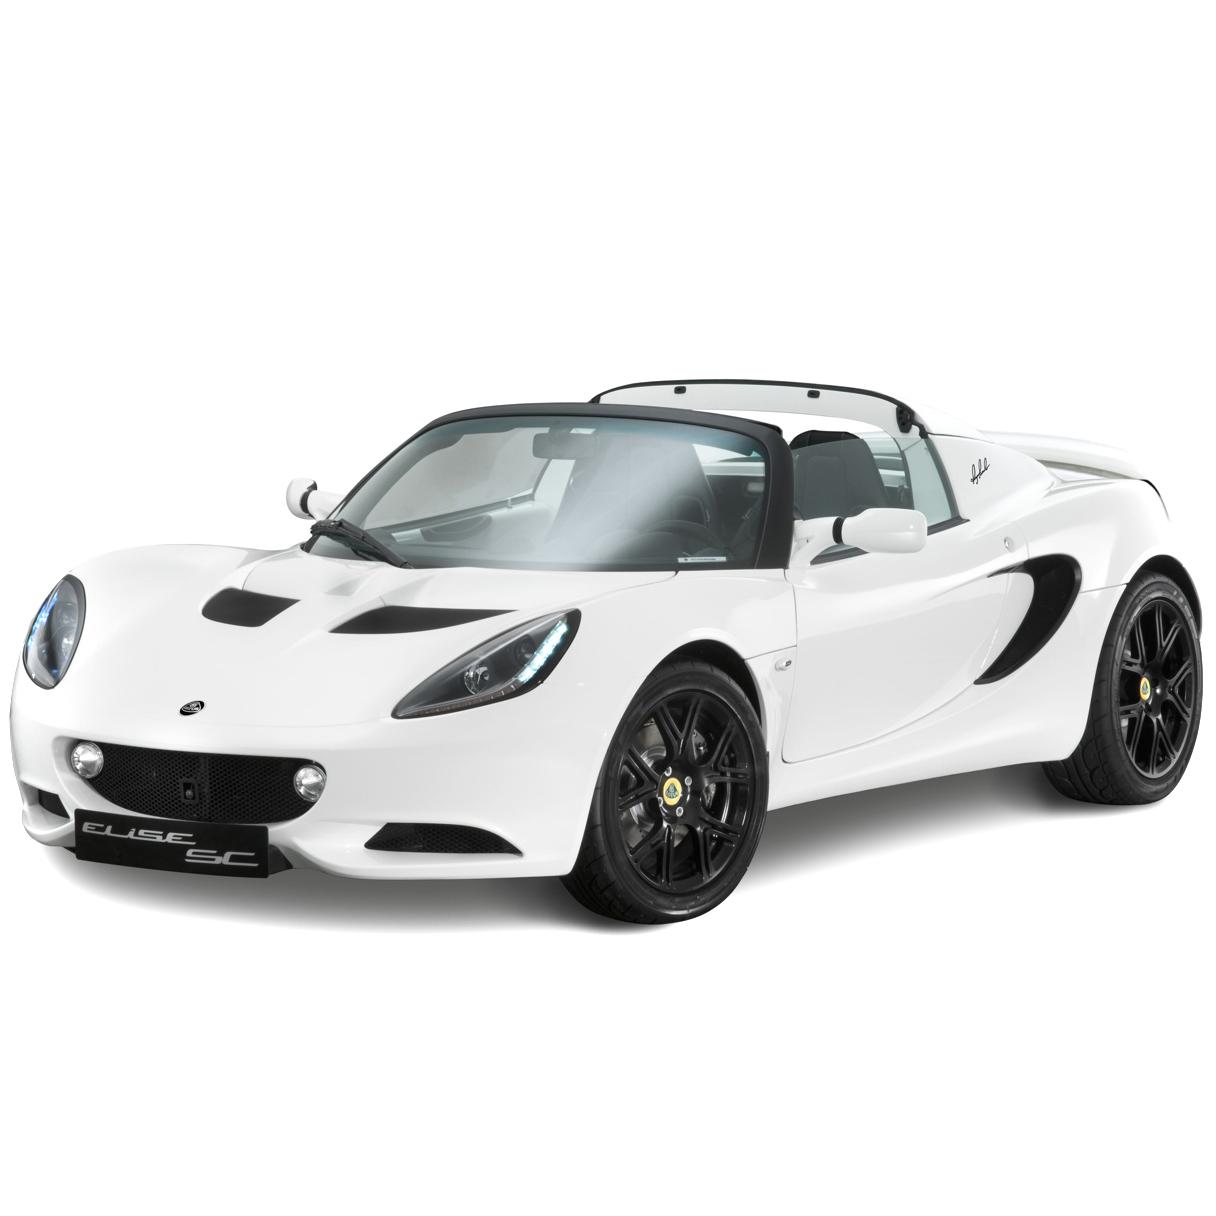 Lotus Elise Series 1 1996-2001